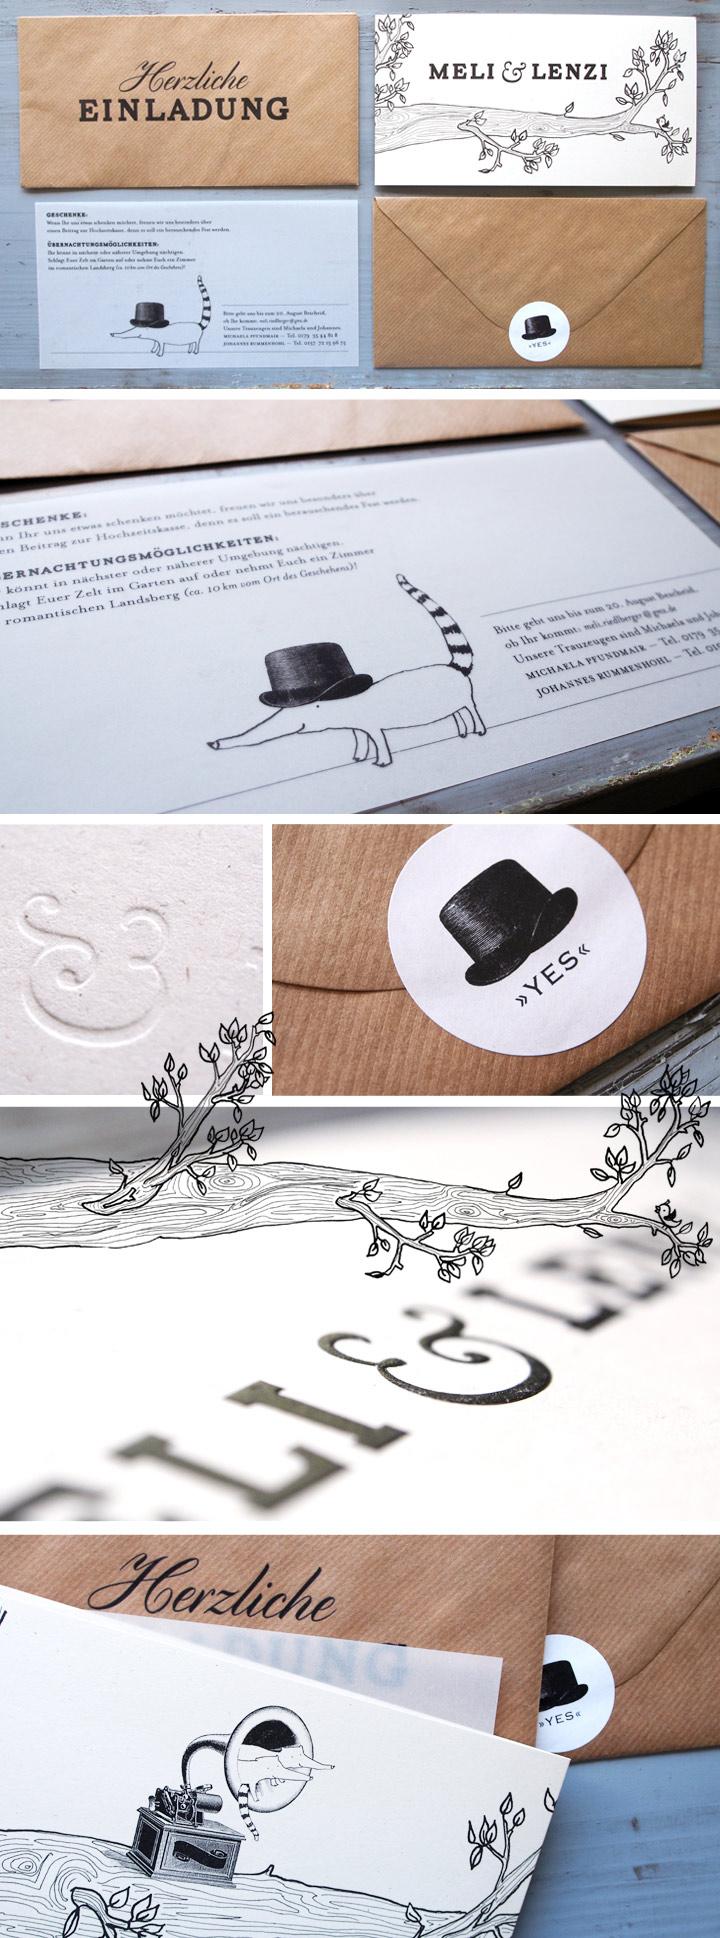 Jutta Geisenhofer | Grafik Design Augsburg Individuelle Hochzeits Einladung    Jutta Geisenhofer | Grafik Design Augsburg